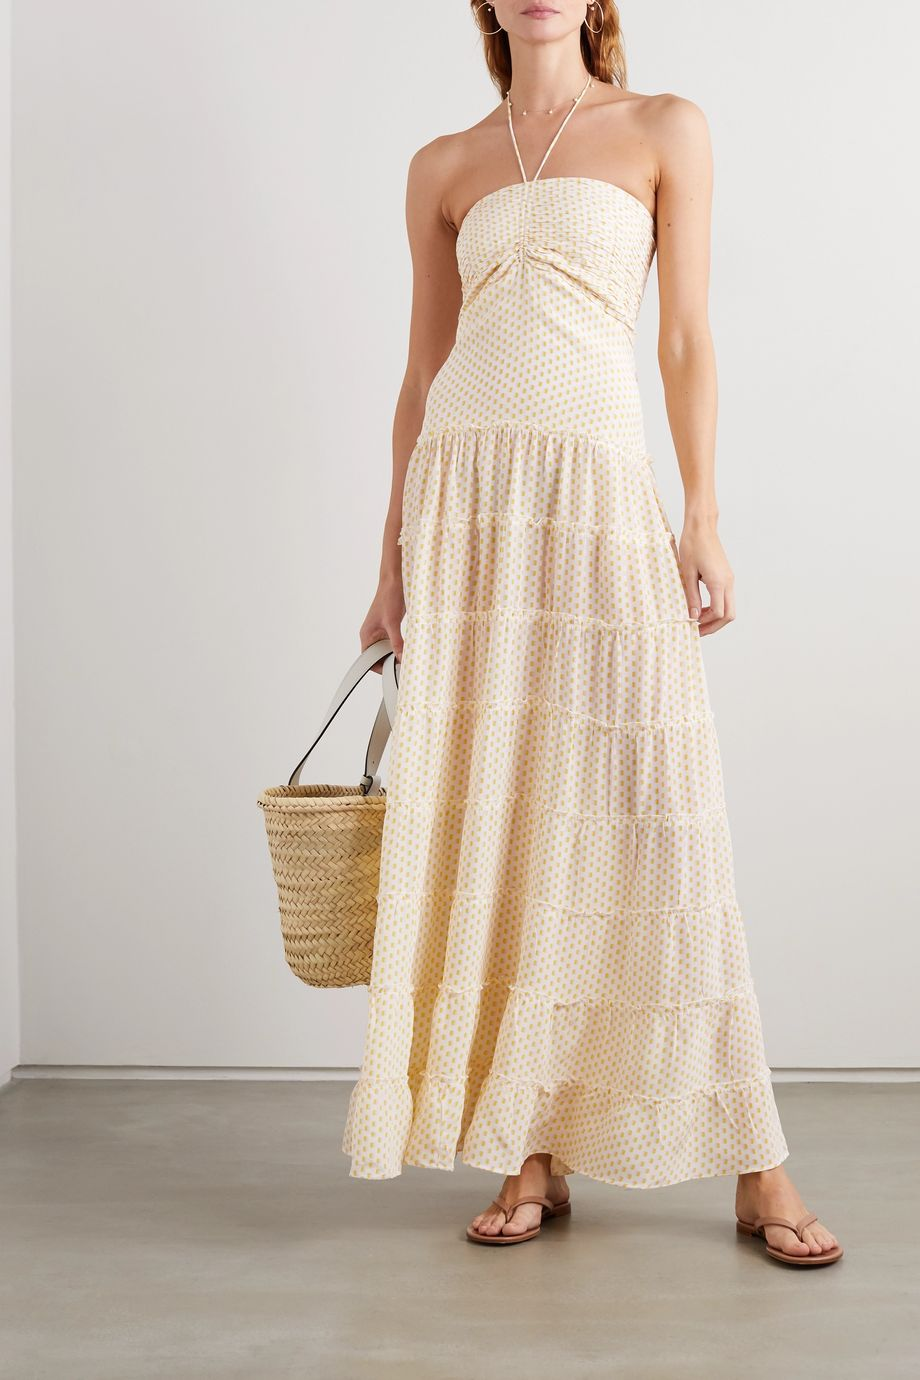 Evarae Phoebe 分层式真丝双绉挂脖超长连衣裙